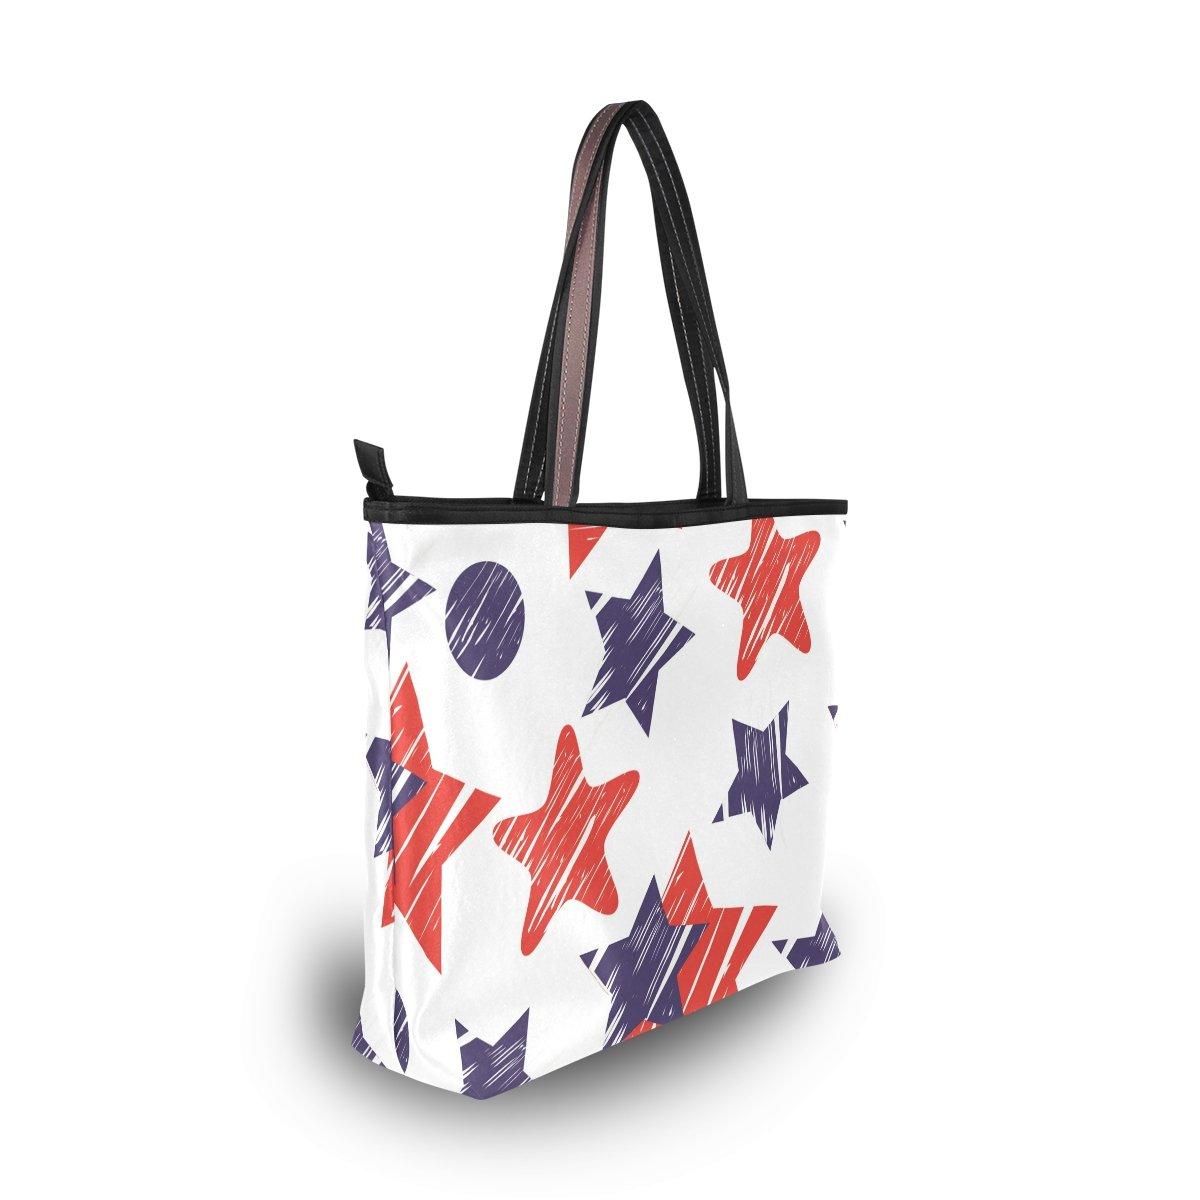 DEYYA Women Large Tote Bag July 4Th Independence Day American Flag Stars Shoulder Handbags Satchel Messenger Bags for Ladies